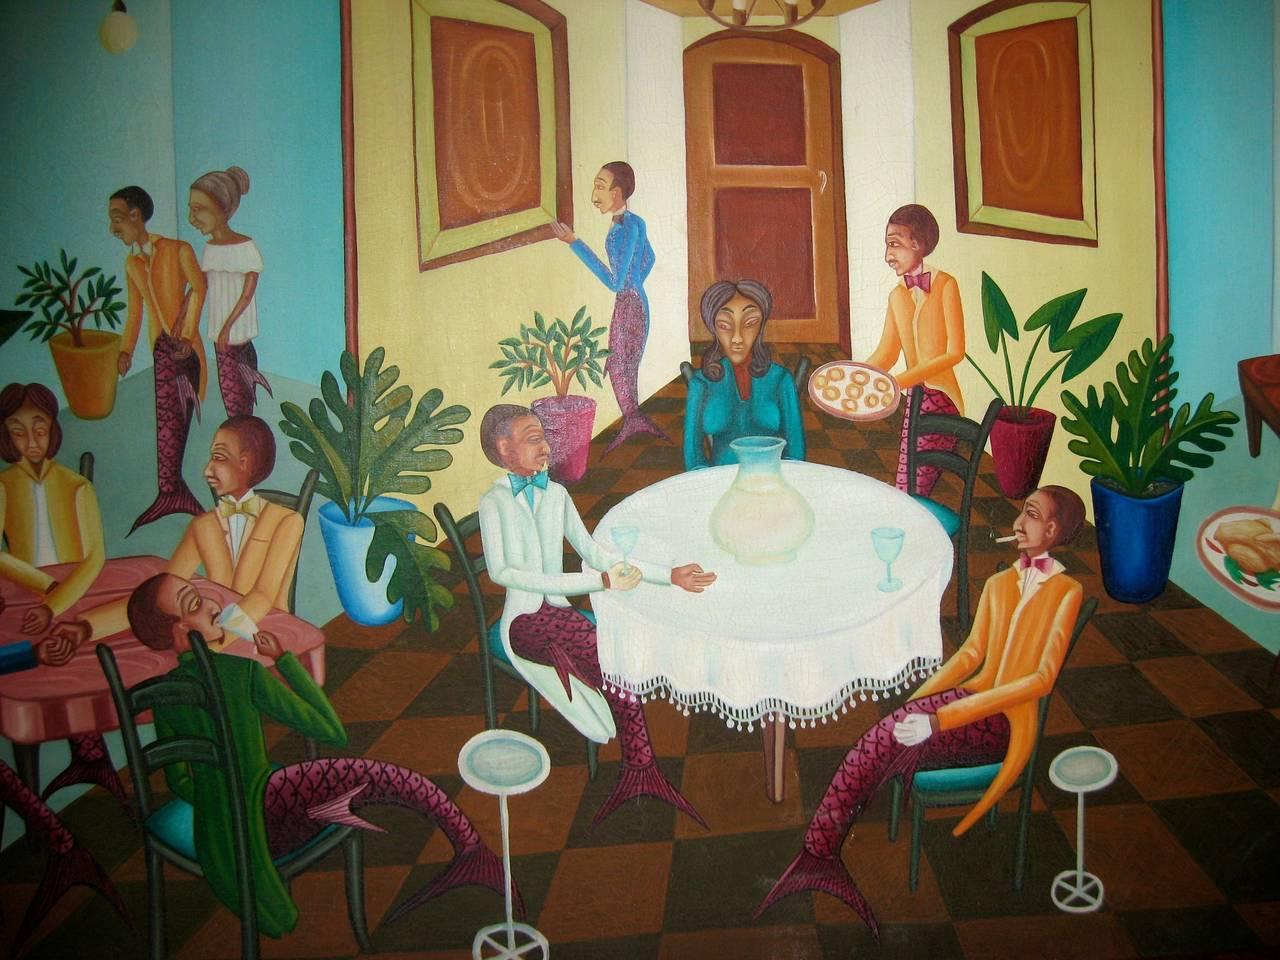 Surrealist Restaurant Scene with Mermades and Mermen 3